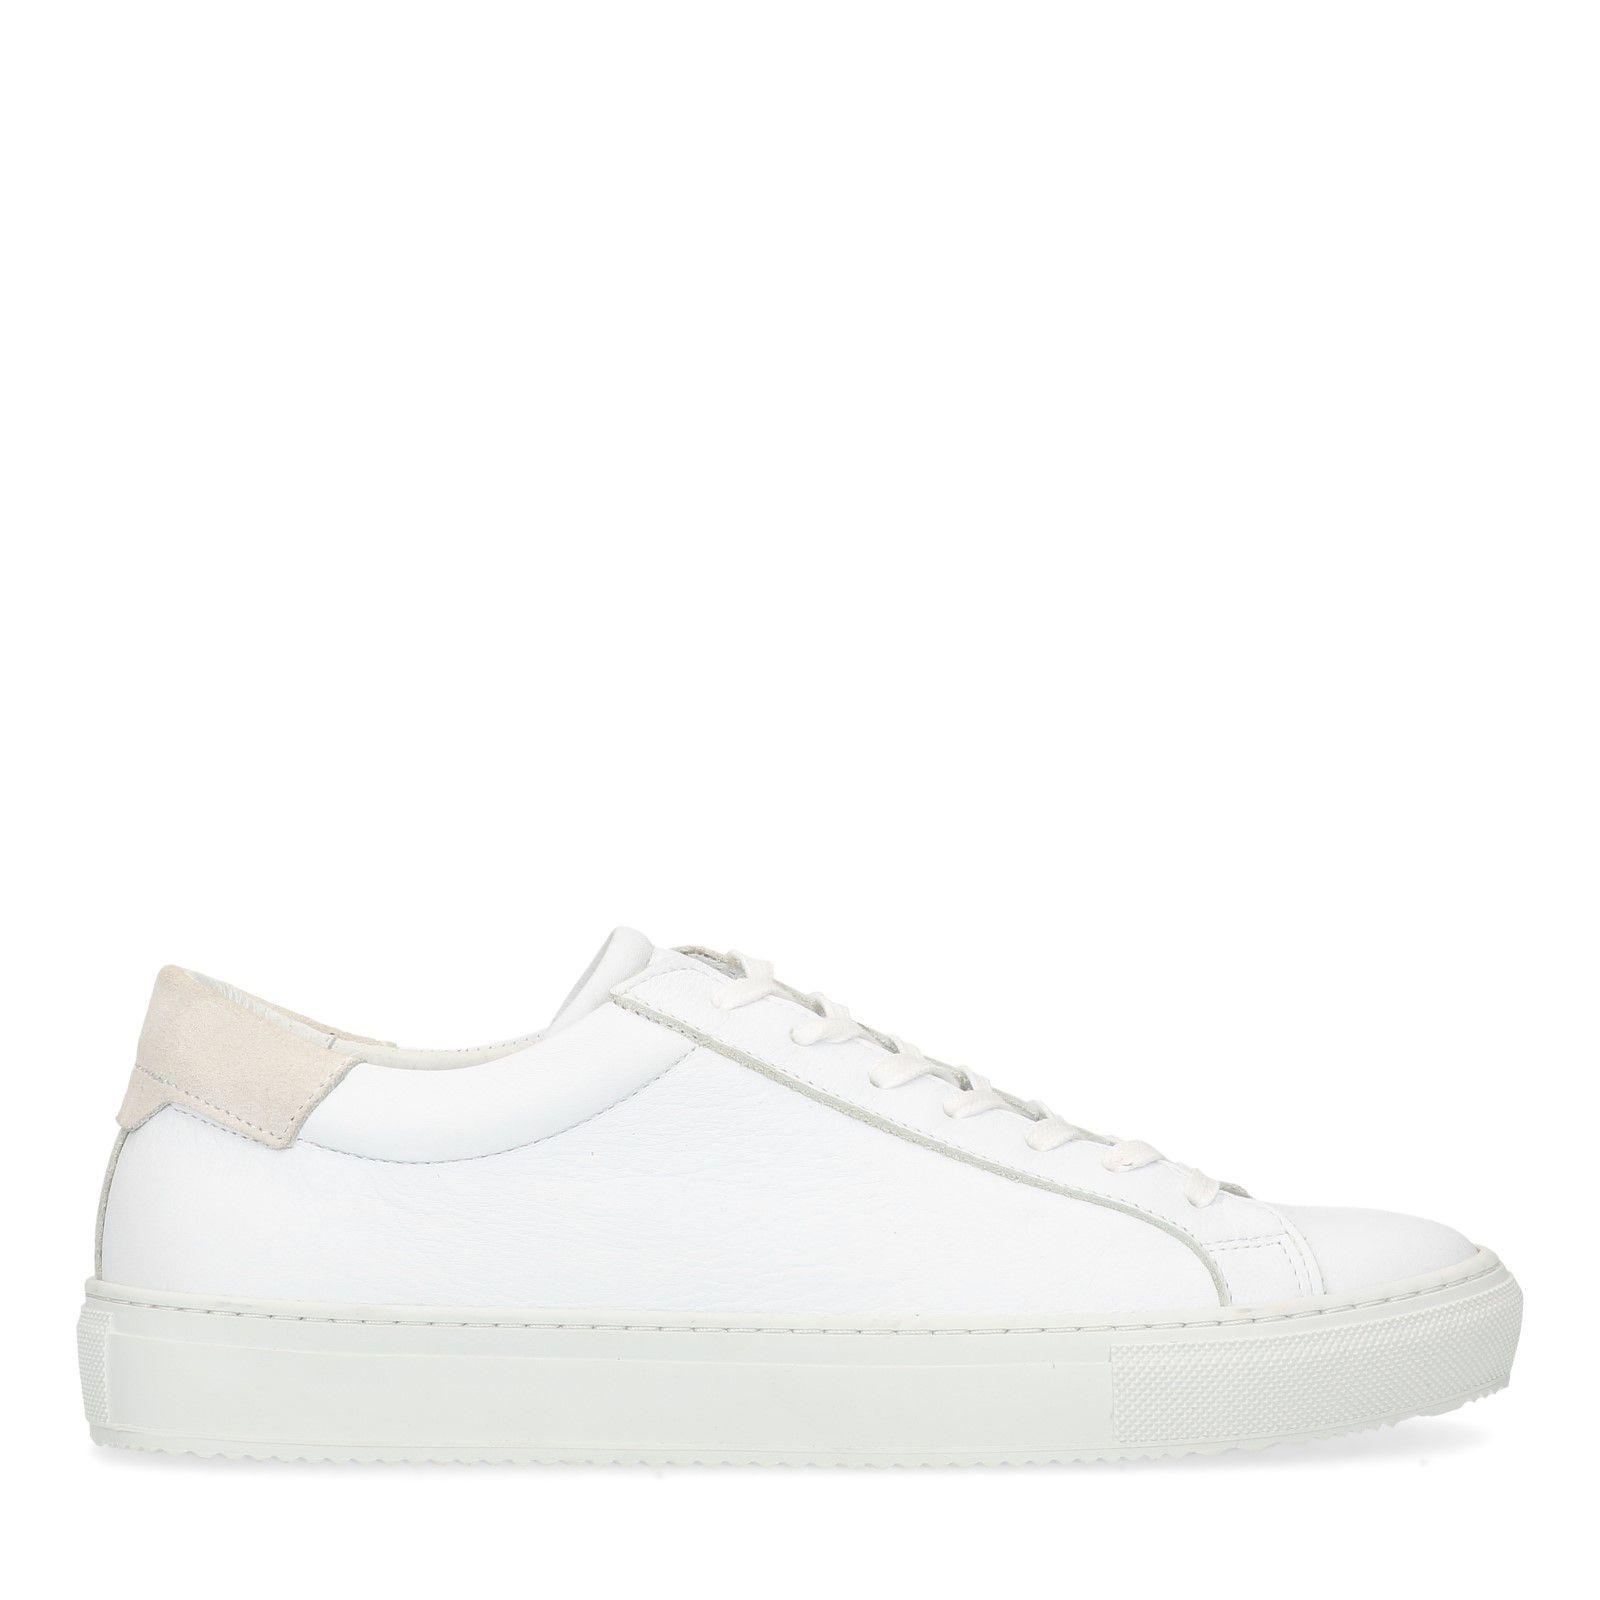 Heren Sneakers Sneakers Heren Sneakers Online ShoppenManfield Heren Online ShoppenManfield Online 5RjL4A